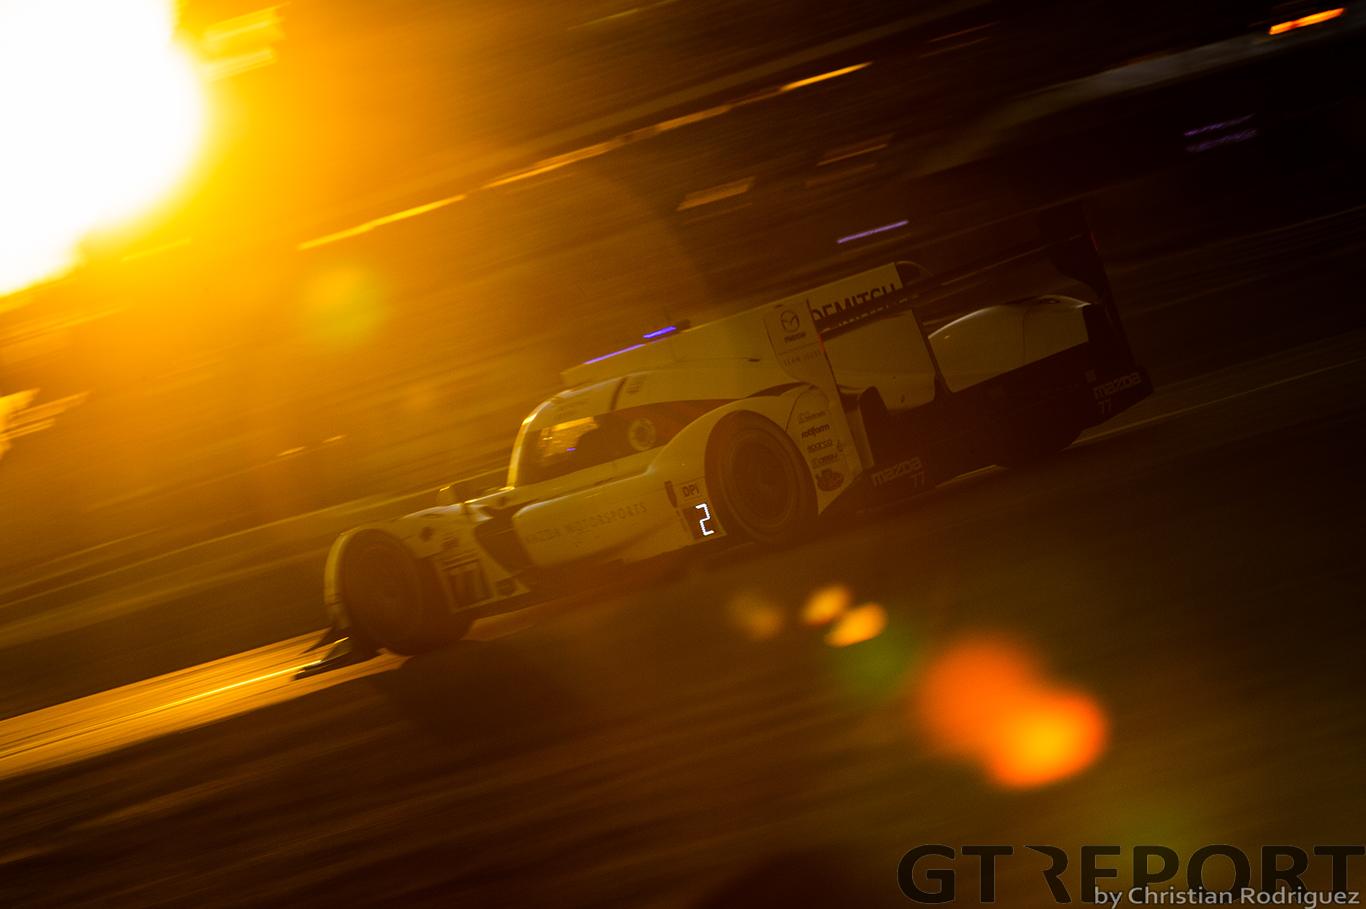 Daytona 24 Hours: Mazda and WTR take turns leading as night falls